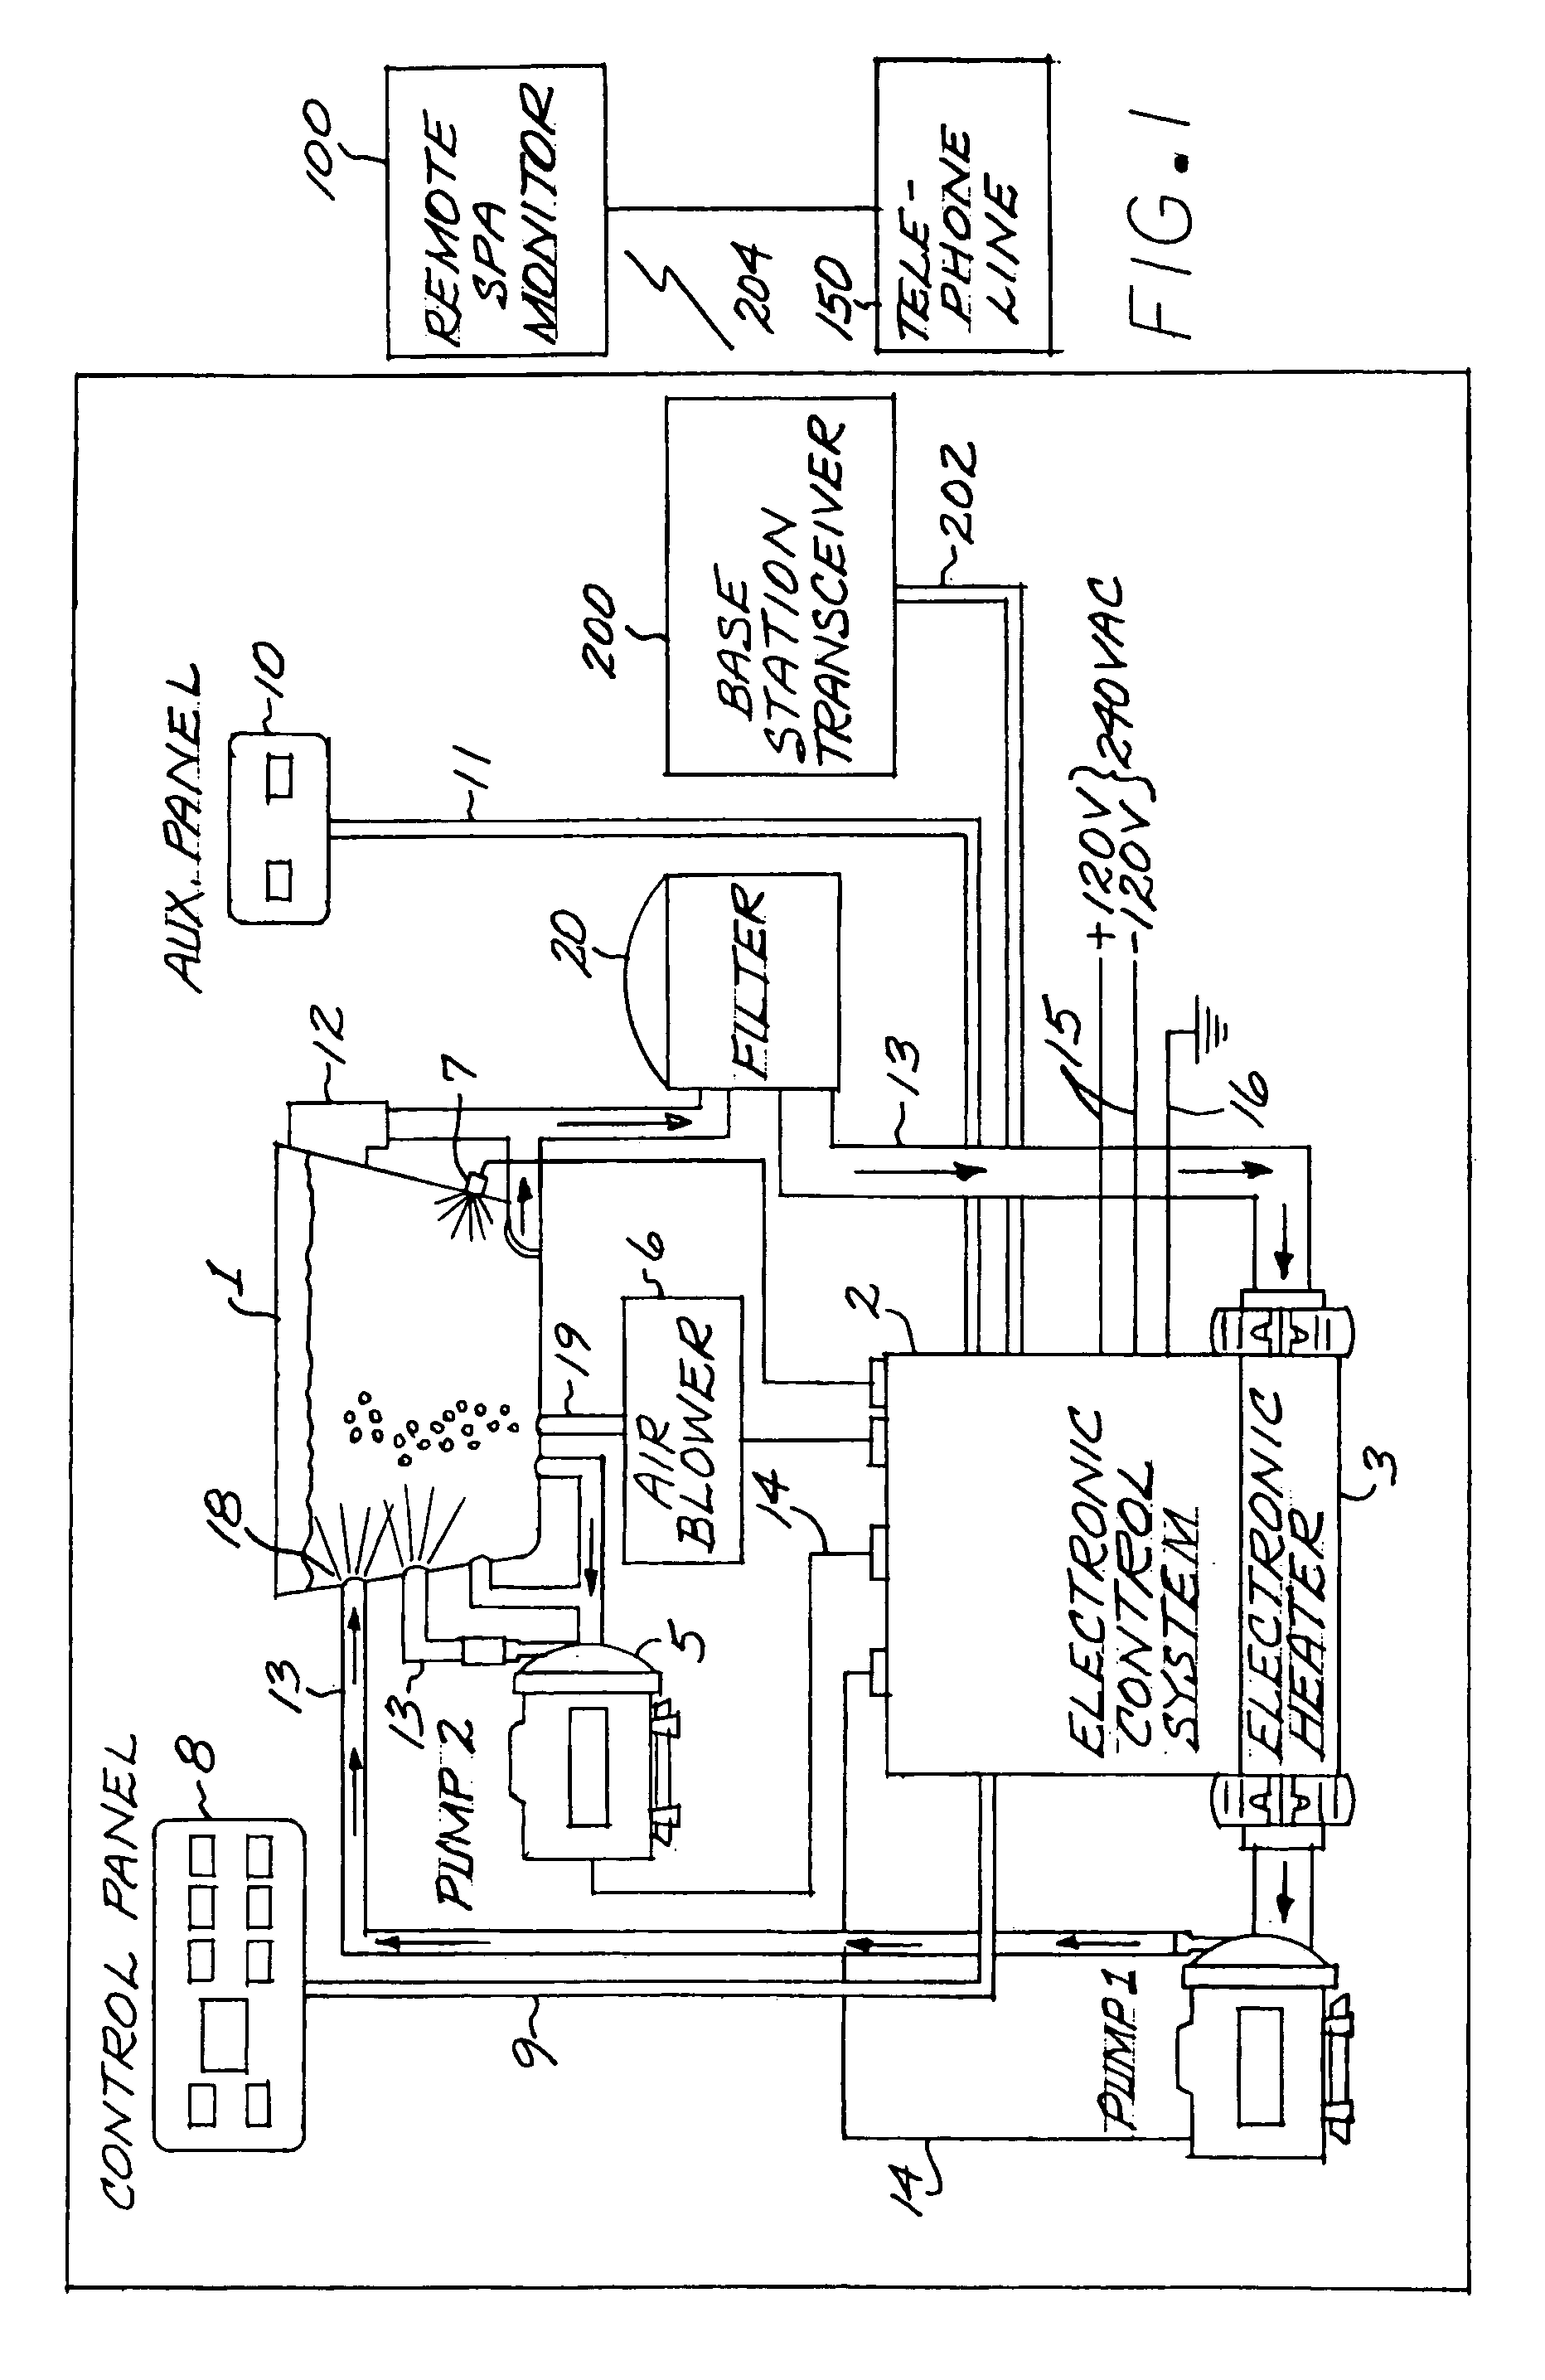 aqua rite wiring diagram ford f350 fuse box circuit board parts